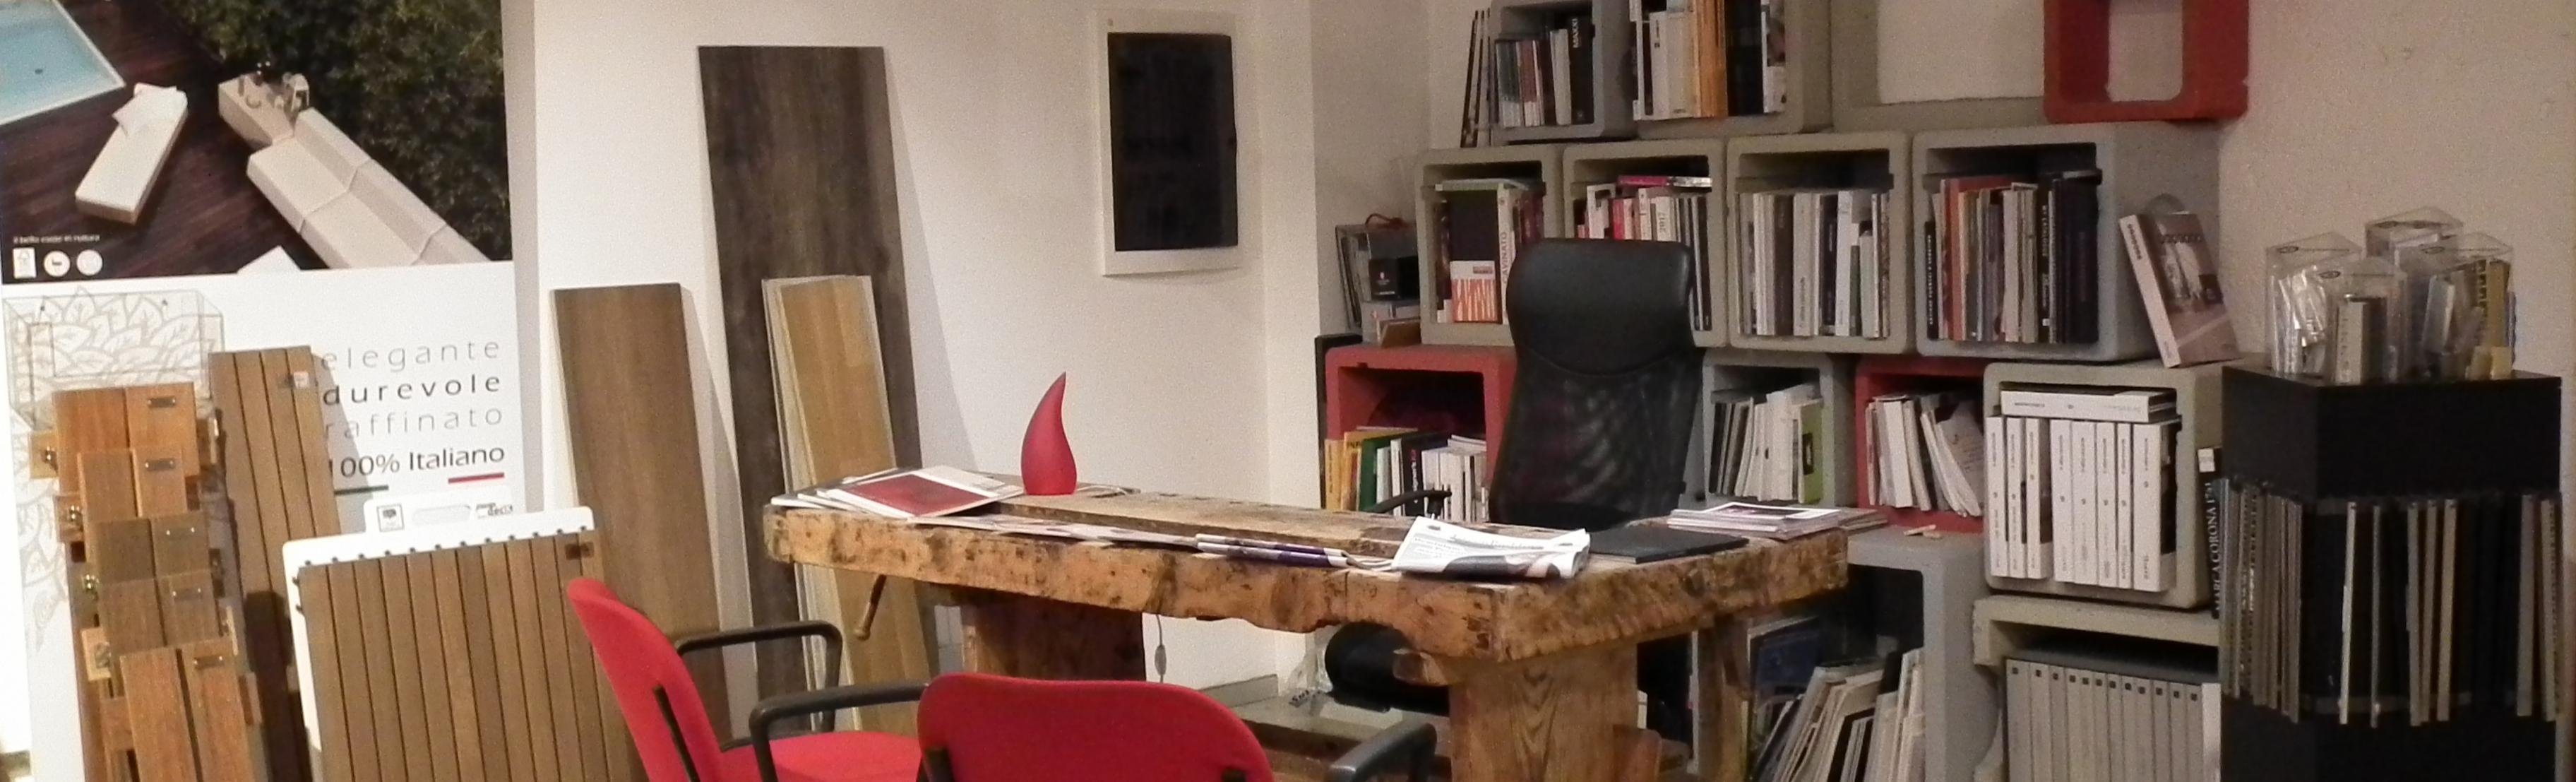 Casa Della Carta Padova carta geom. carlo srl | linkedin